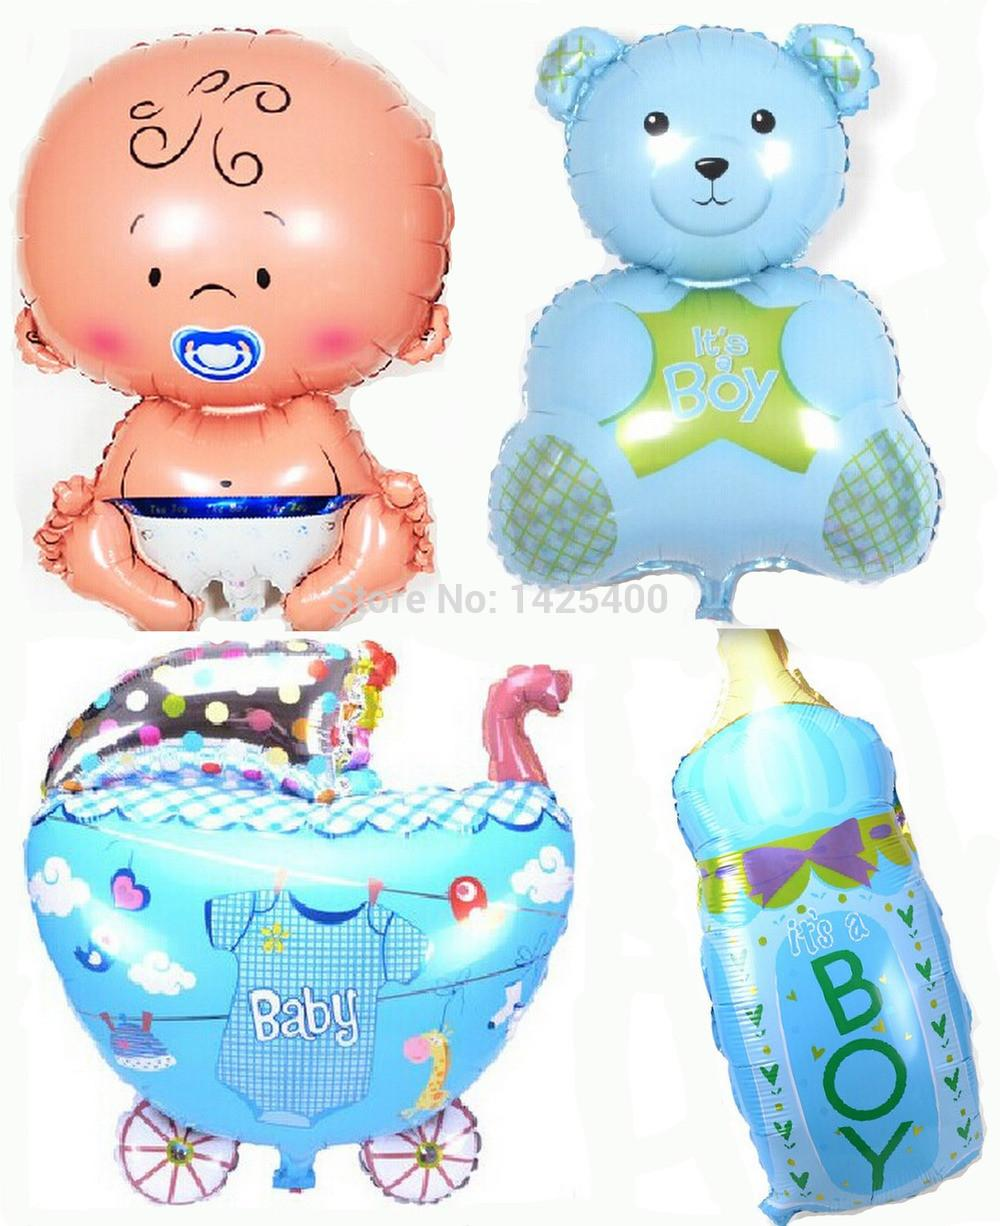 Free shipping new baby - baby - Bears - bottle balloon 4pcs-lots of children's toys Birthday balloon wholesale